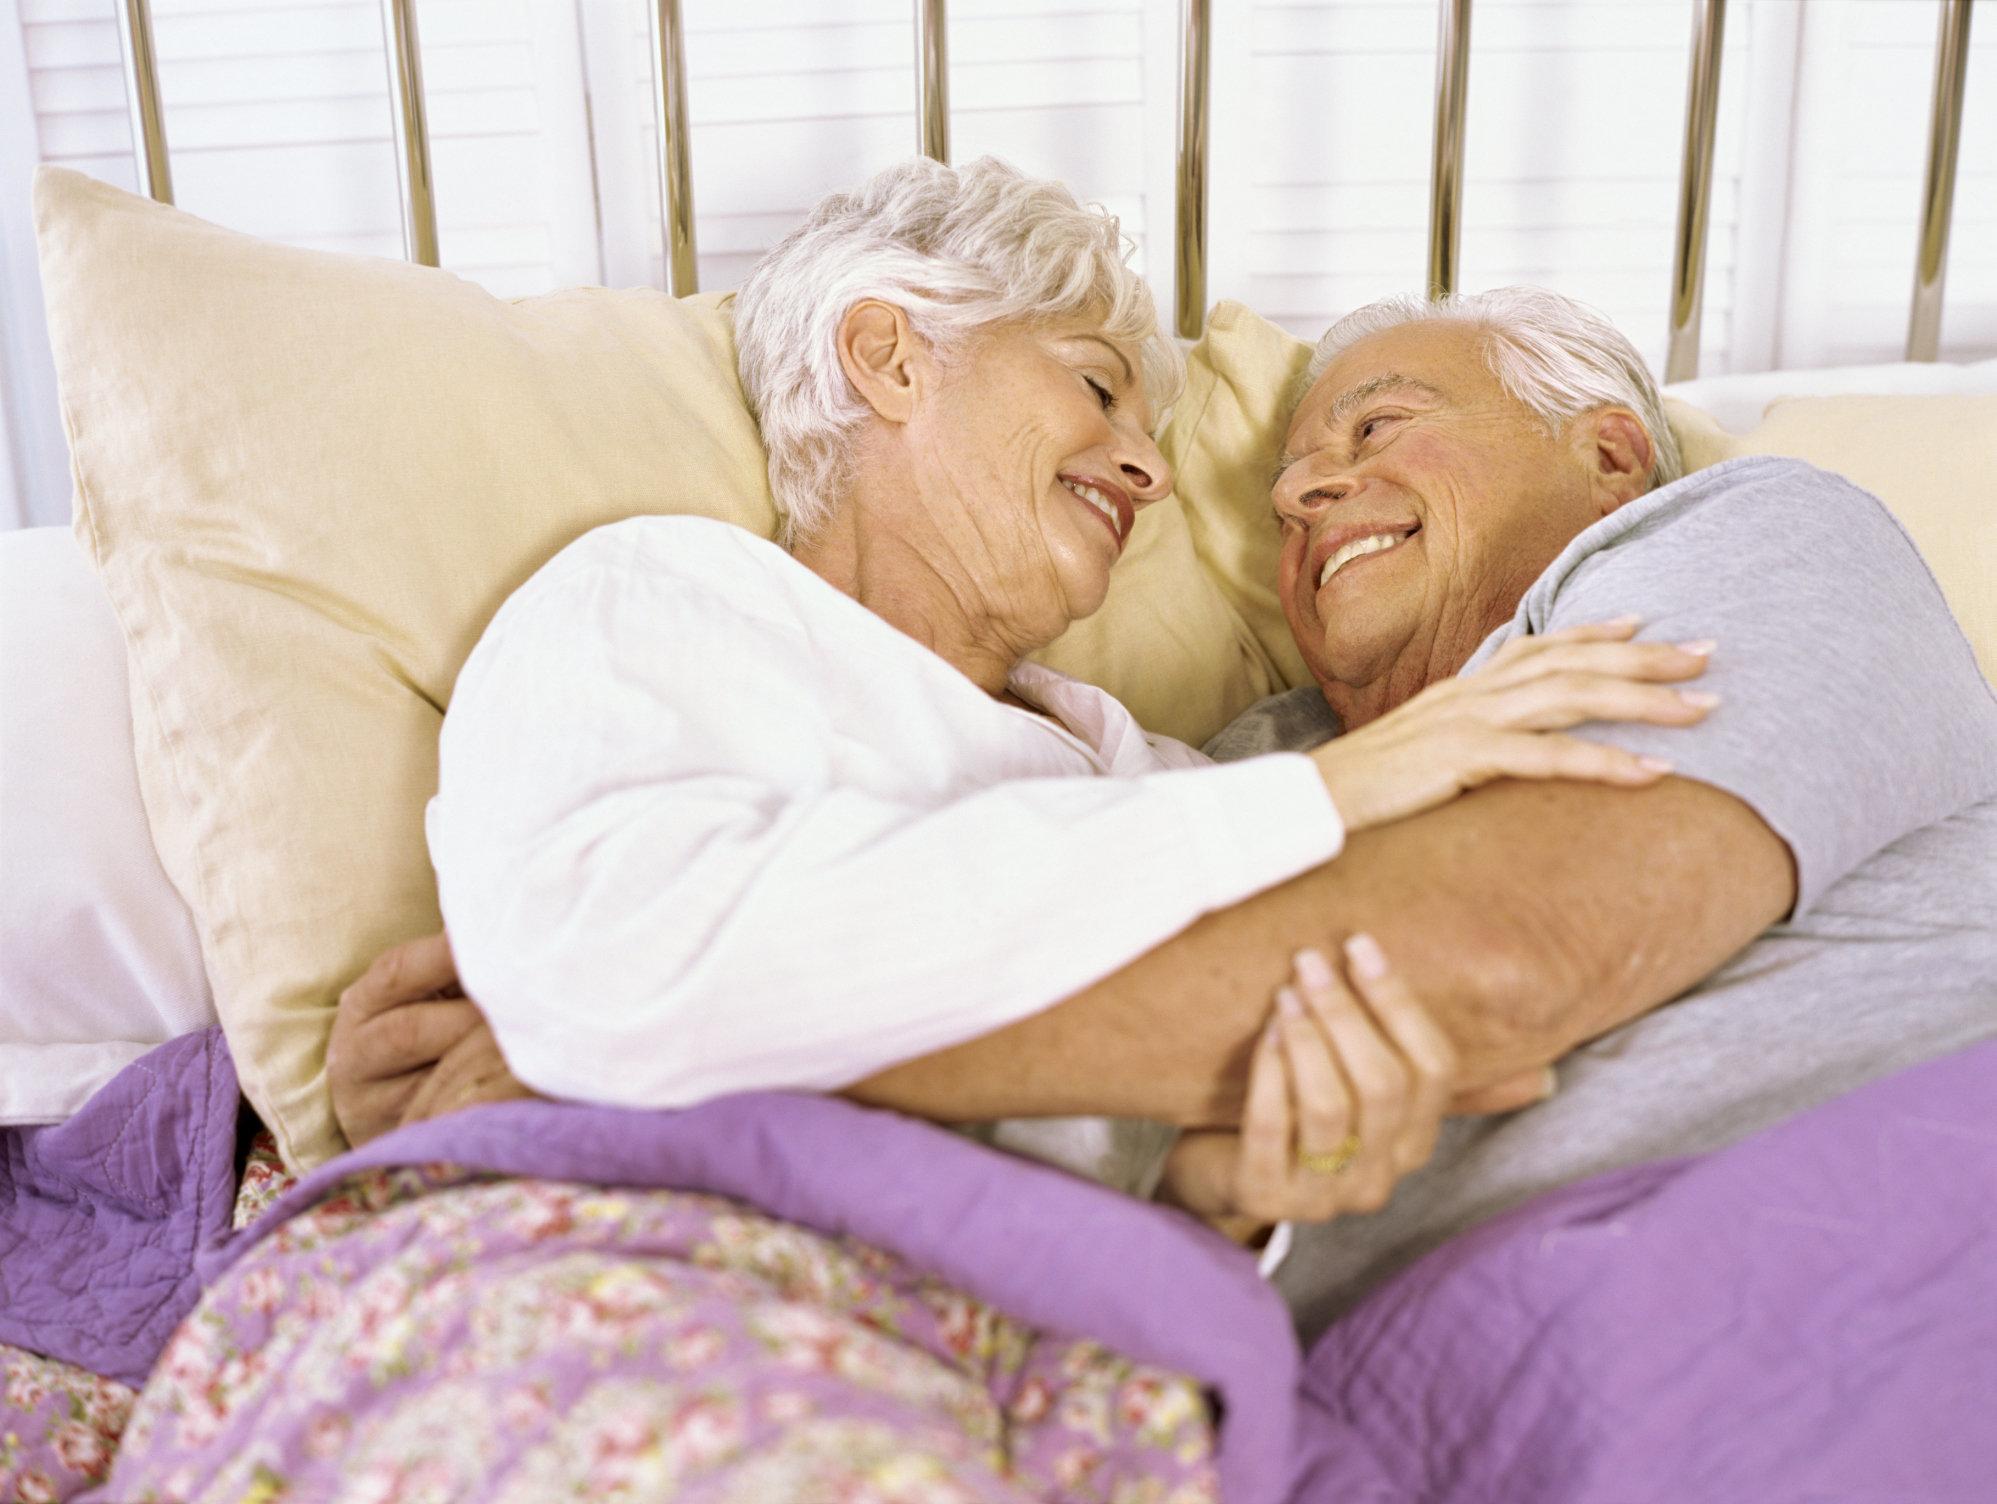 Sex among retirement age citizens